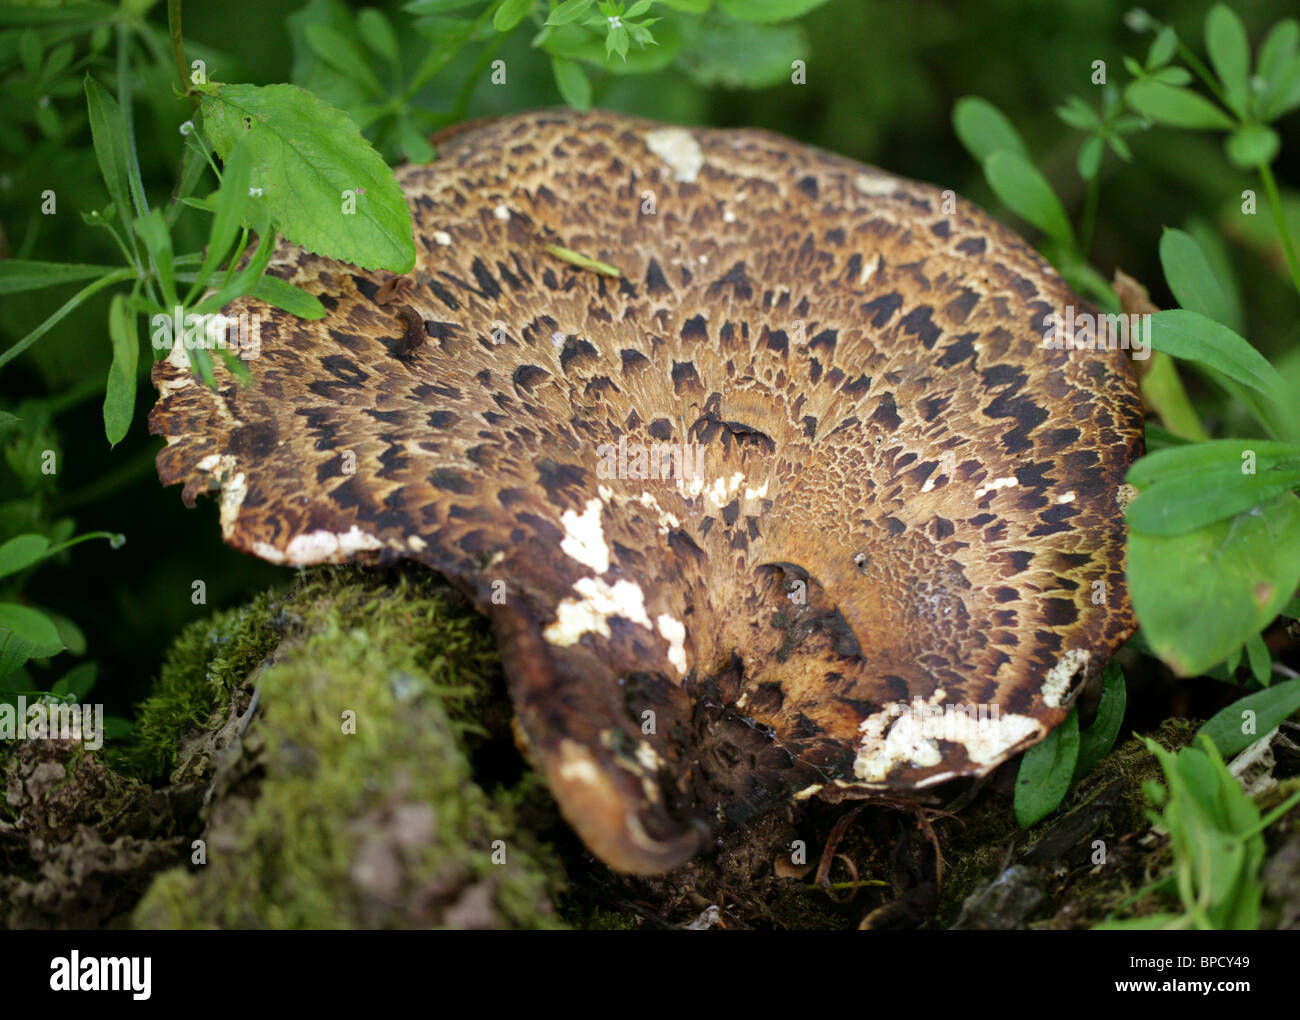 Caballete de las dríadas o escamosas, Polypore Polyporus squamosus, Polyporaceae. Soporte hongo. Imagen De Stock